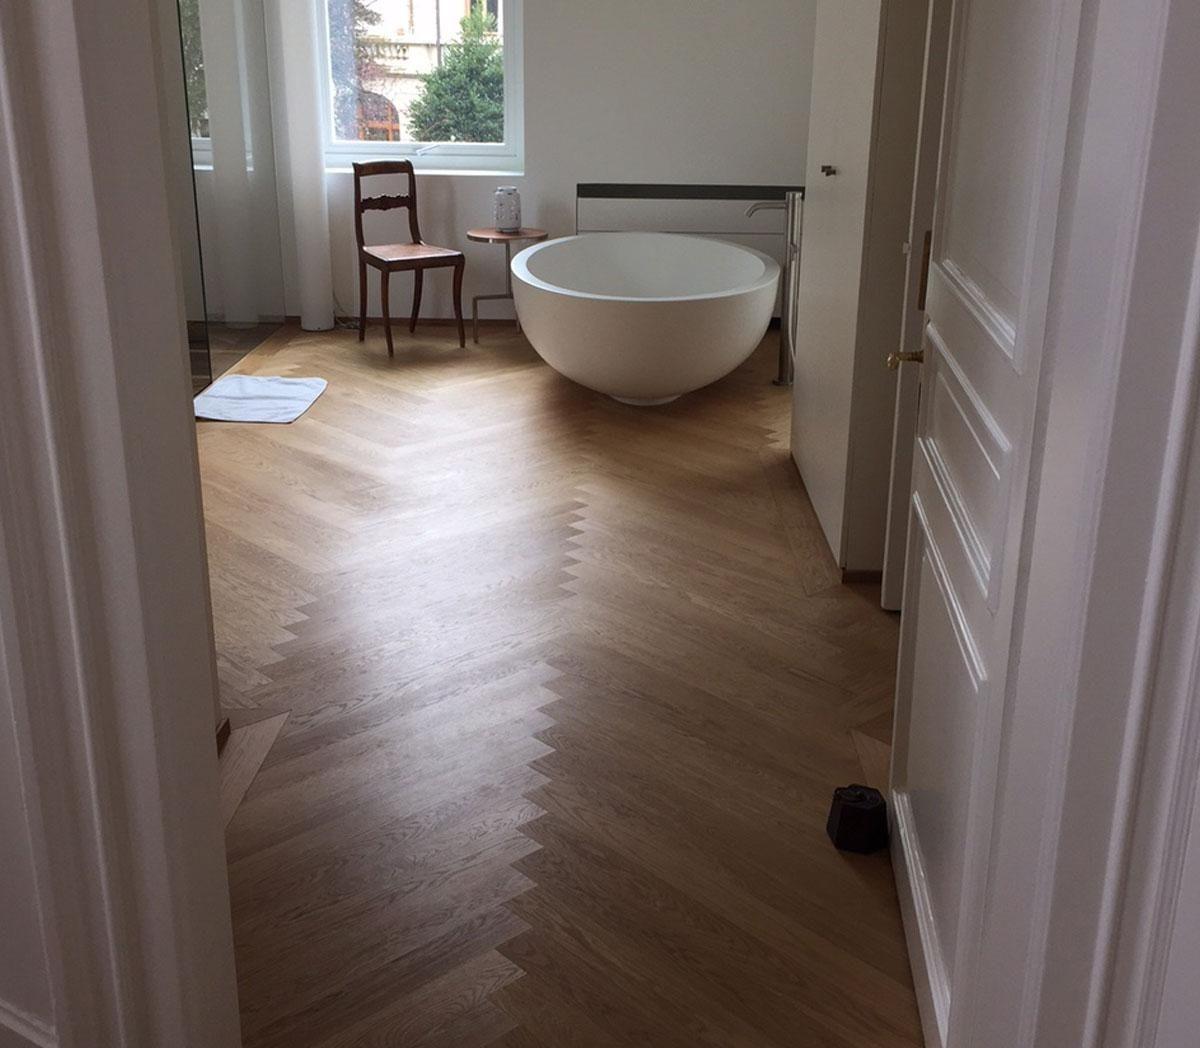 Parkett Bodenbelage Linoleum Pvc Kautschuk Teppiche Designbelage In Reinach Basel Designbelag Parkett Bodenbelag